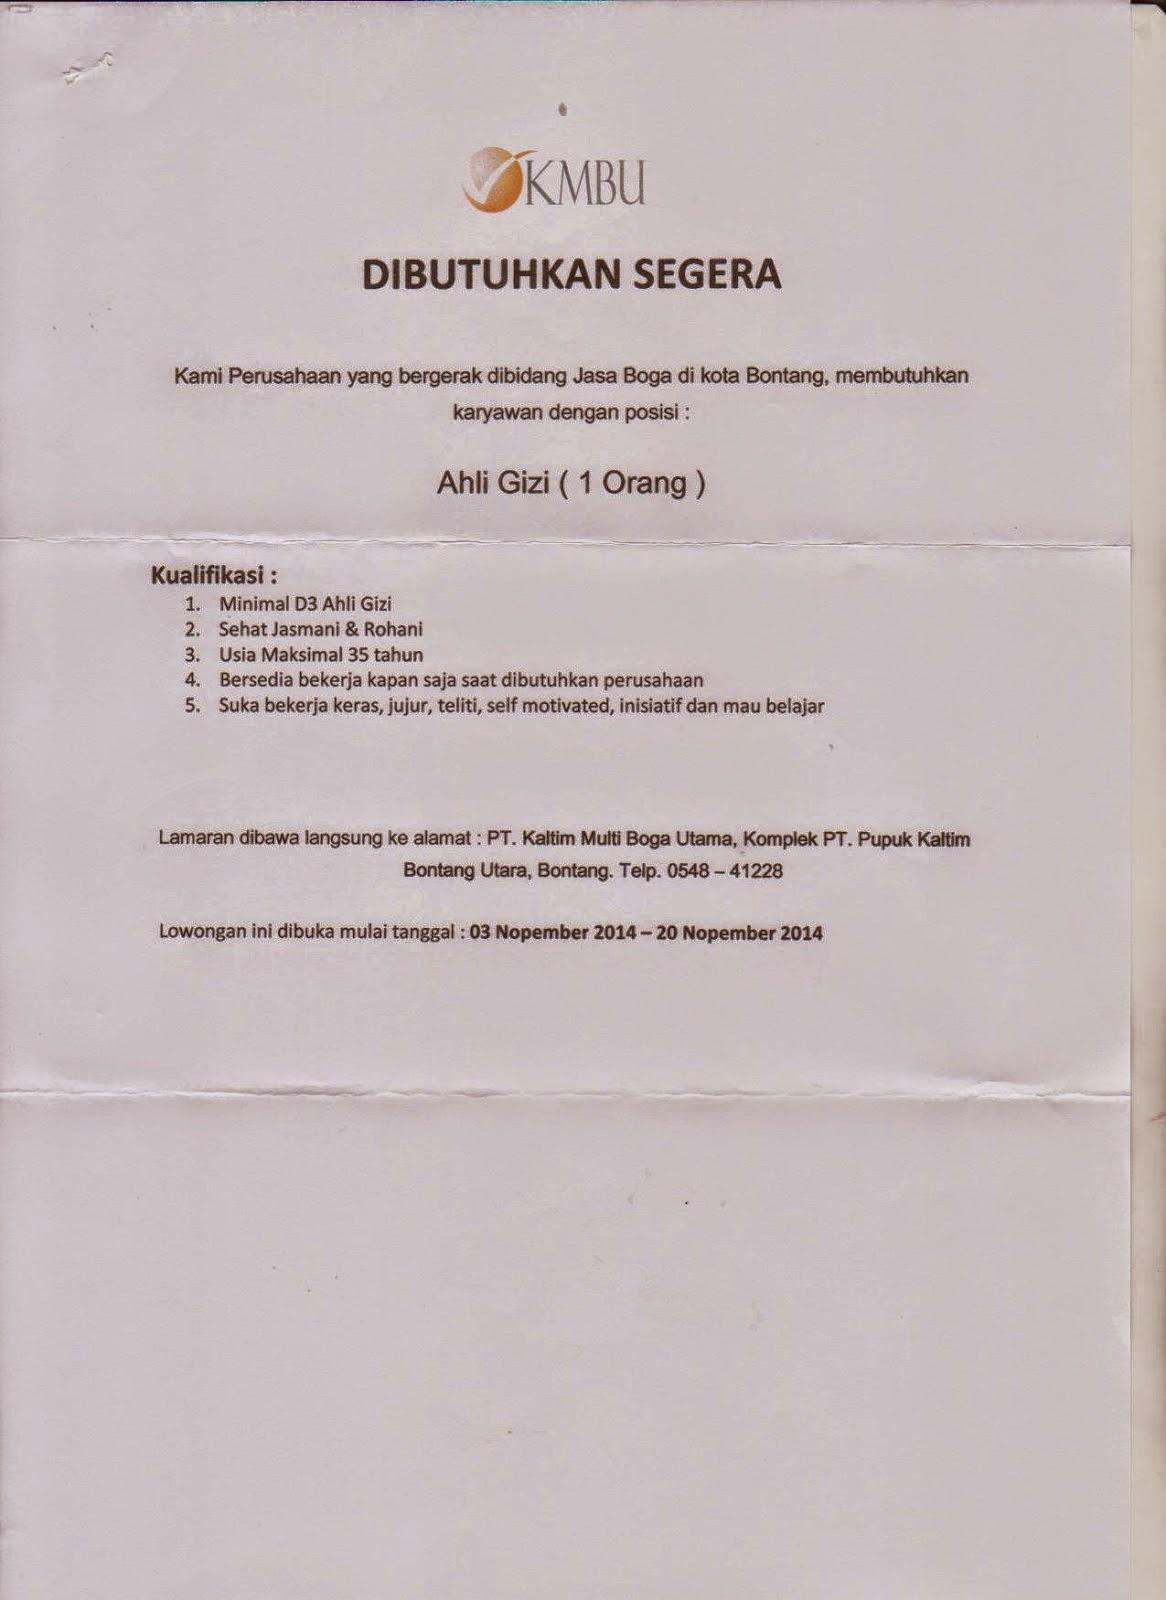 Lowongan Kerja D3 Ahli Gizi PT KMBU Bontang